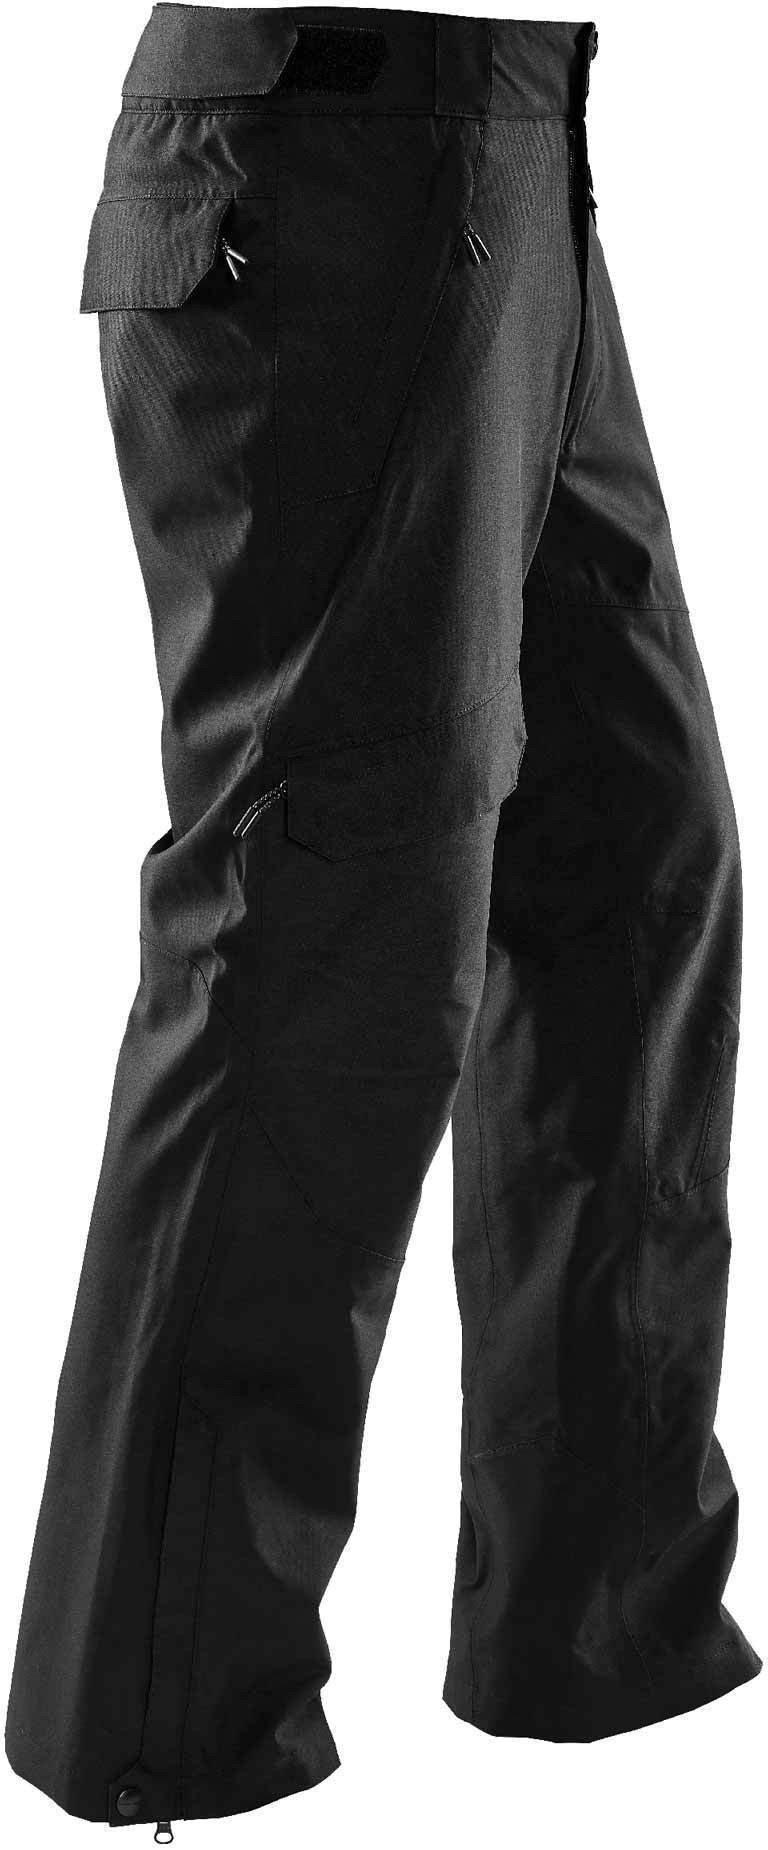 WTSTEP-3 - Black - WorkwearToronto.com - Men's Technical Pants With Custom Decoration - Custom Clothing in GTA